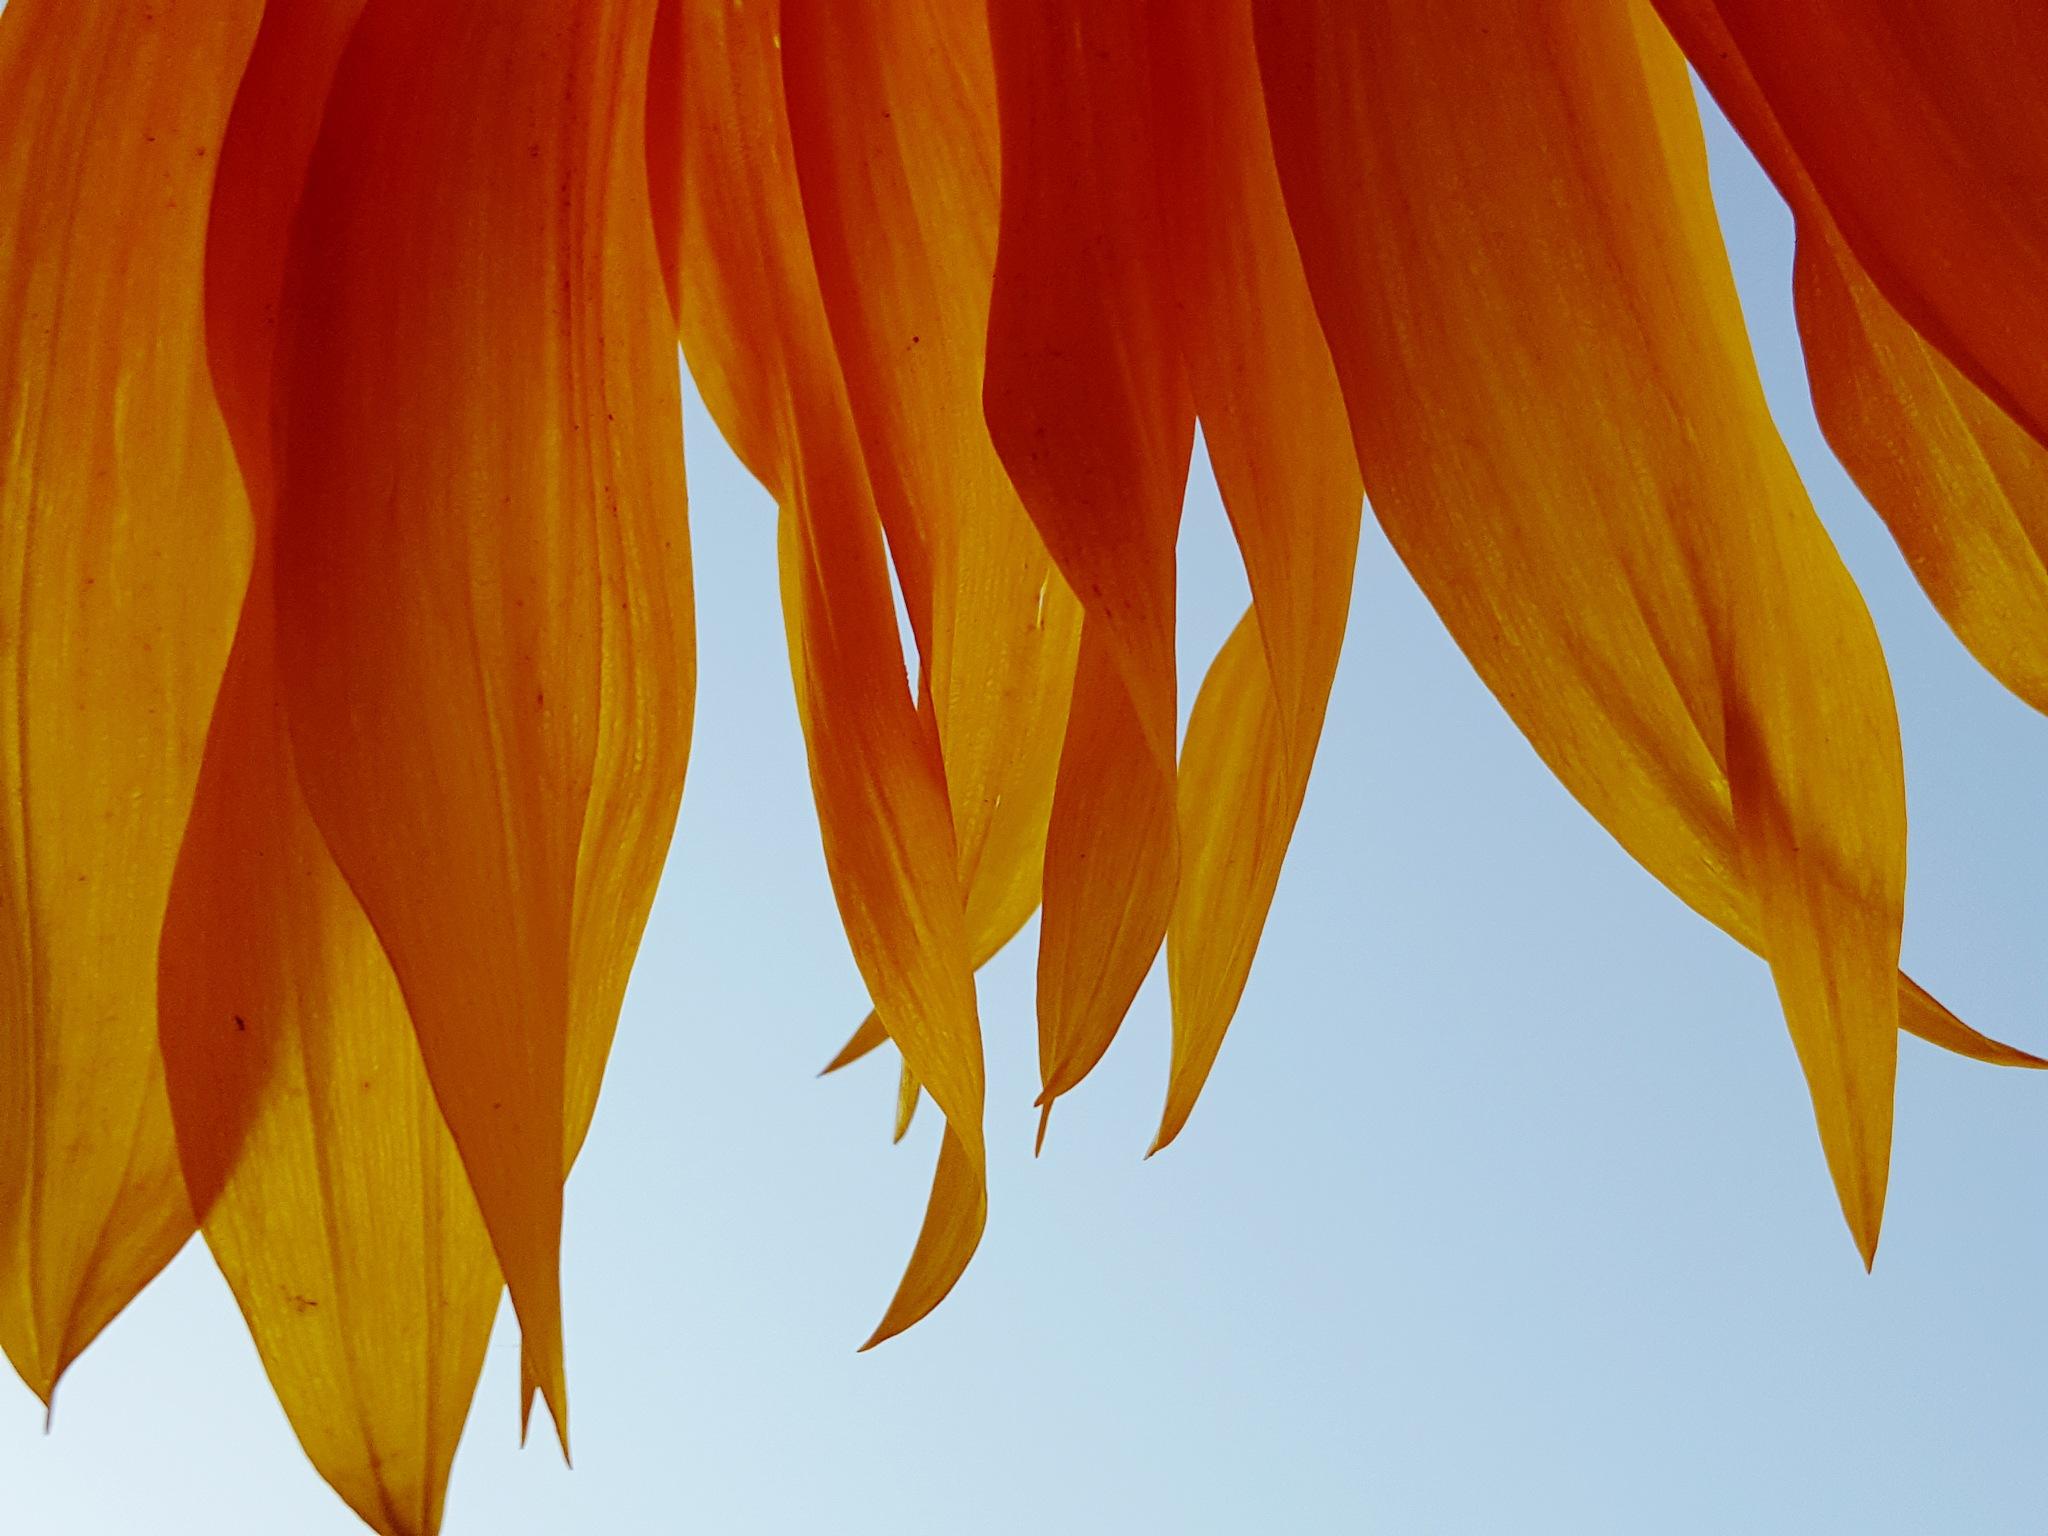 'sunflower*' by John Jack Dubajka